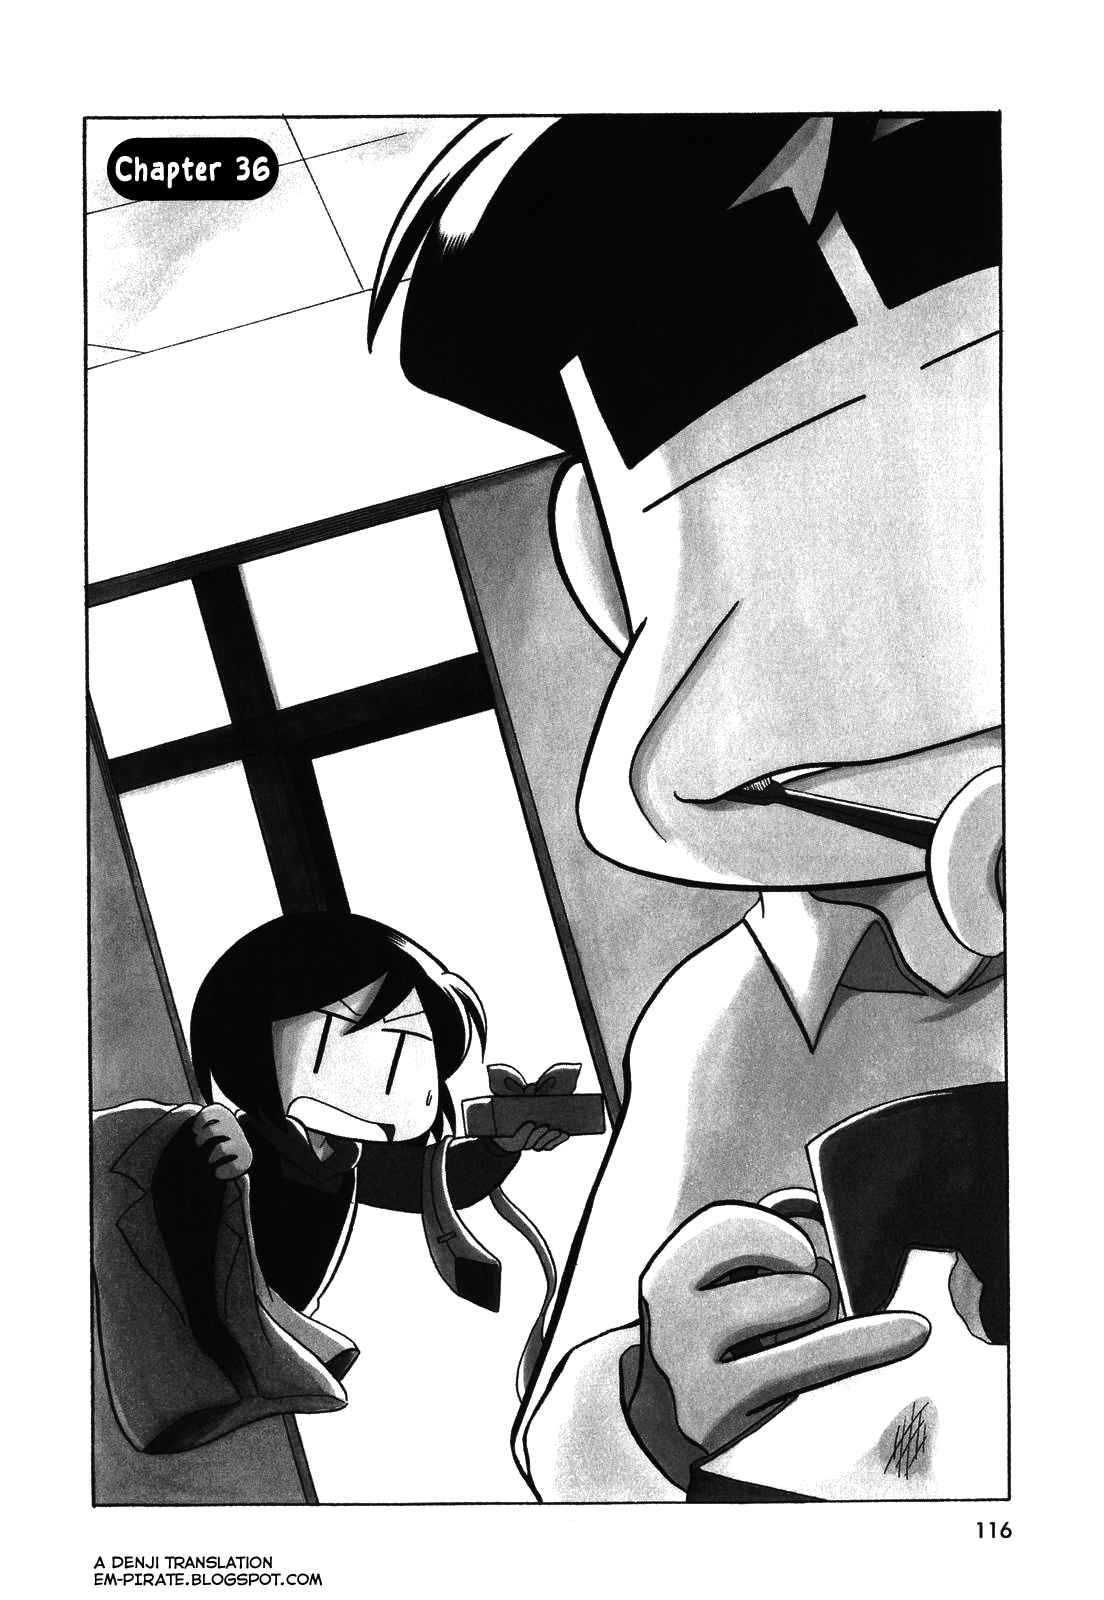 https://img2.nineanime.com/comics/pic2/7/21063/734073/d9d71a3ec466b3cc859fcff3a6cd7e21.jpg Page 1